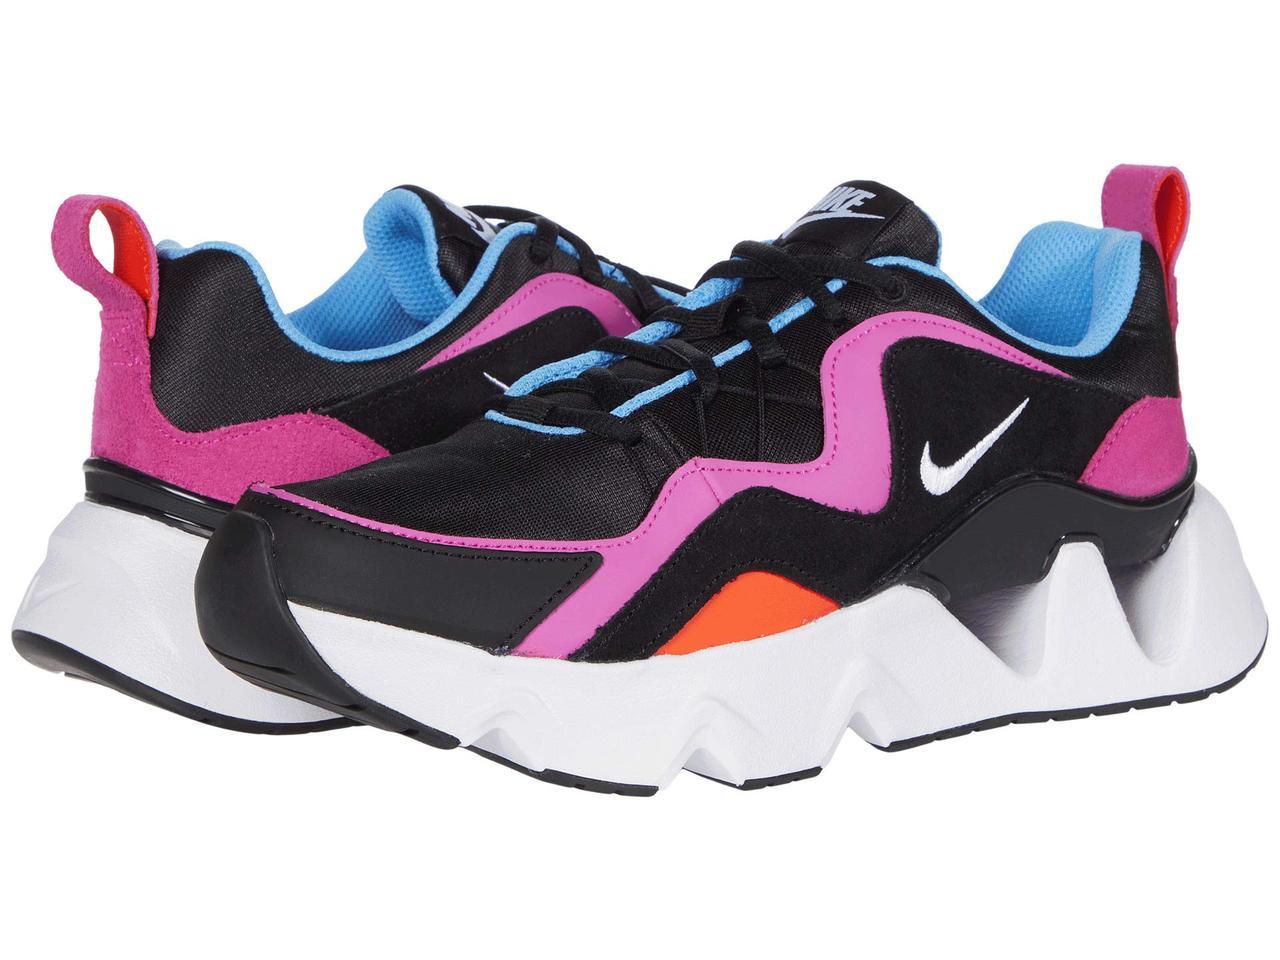 Кроссовки/Кеды (Оригинал) Nike RYZ 365 Black/White/Fire Pink/Team Orange